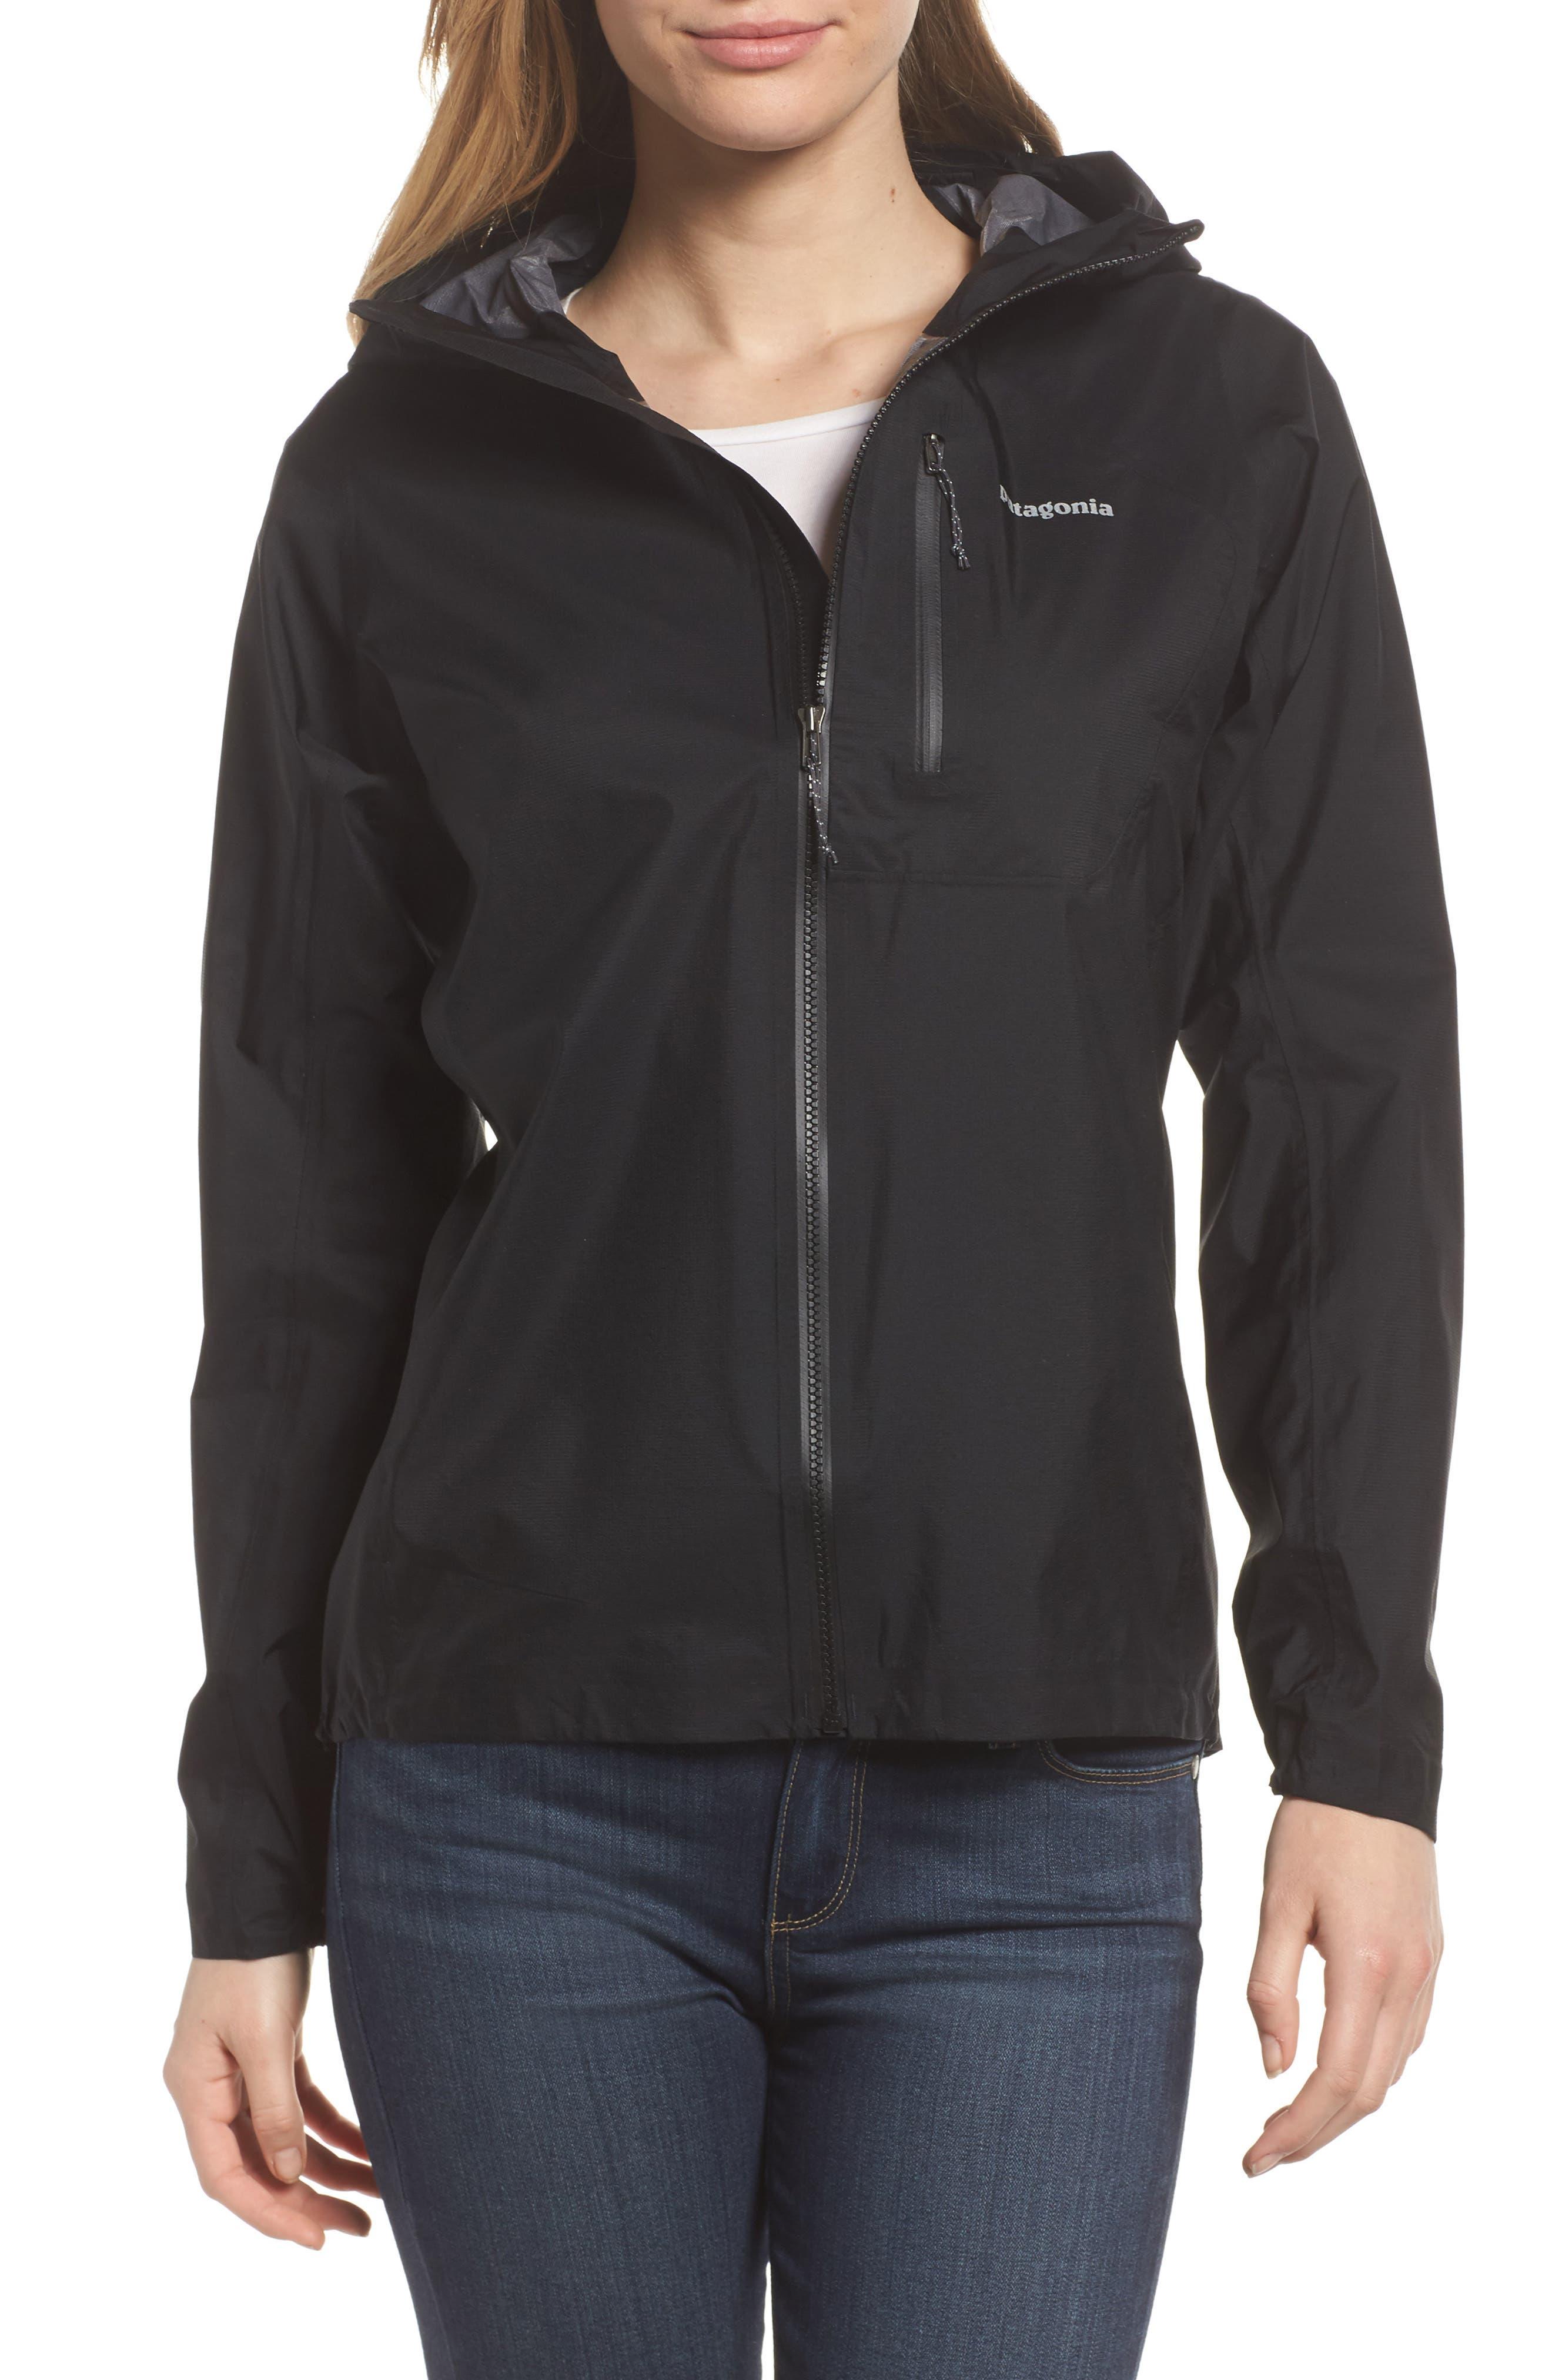 Storm Racer Jacket,                         Main,                         color, Black